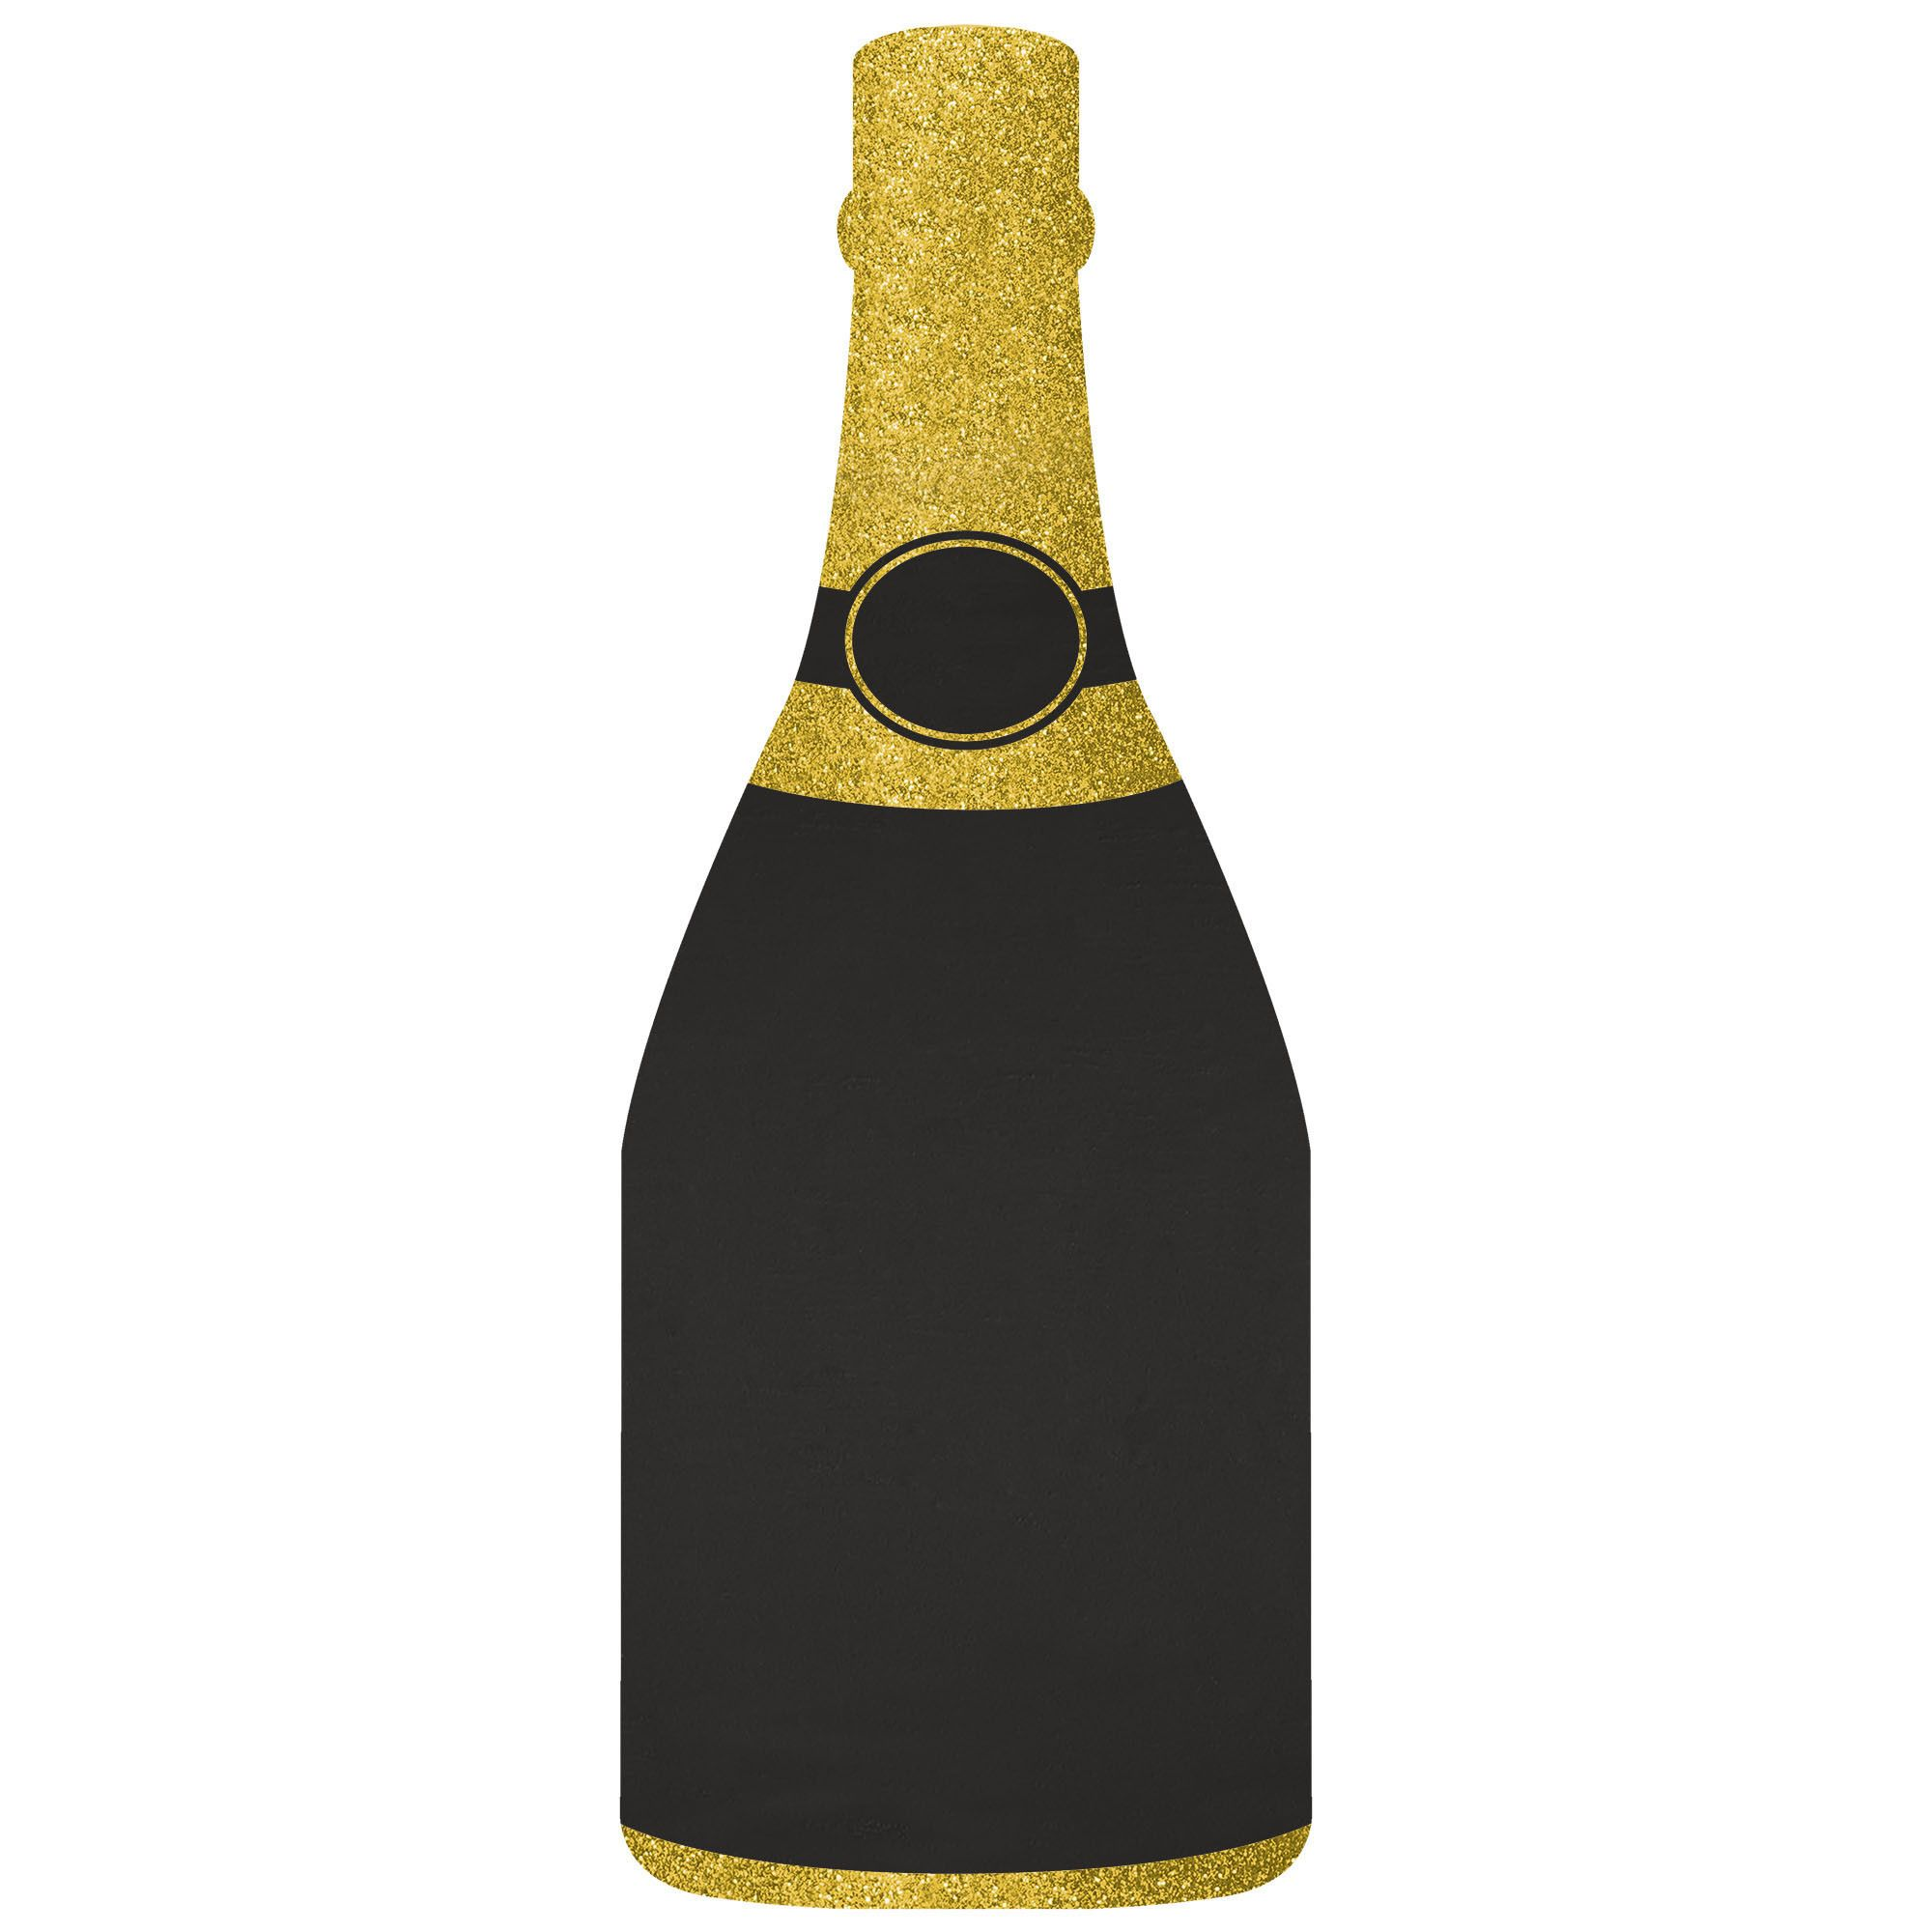 Bubbly Bottle Easel